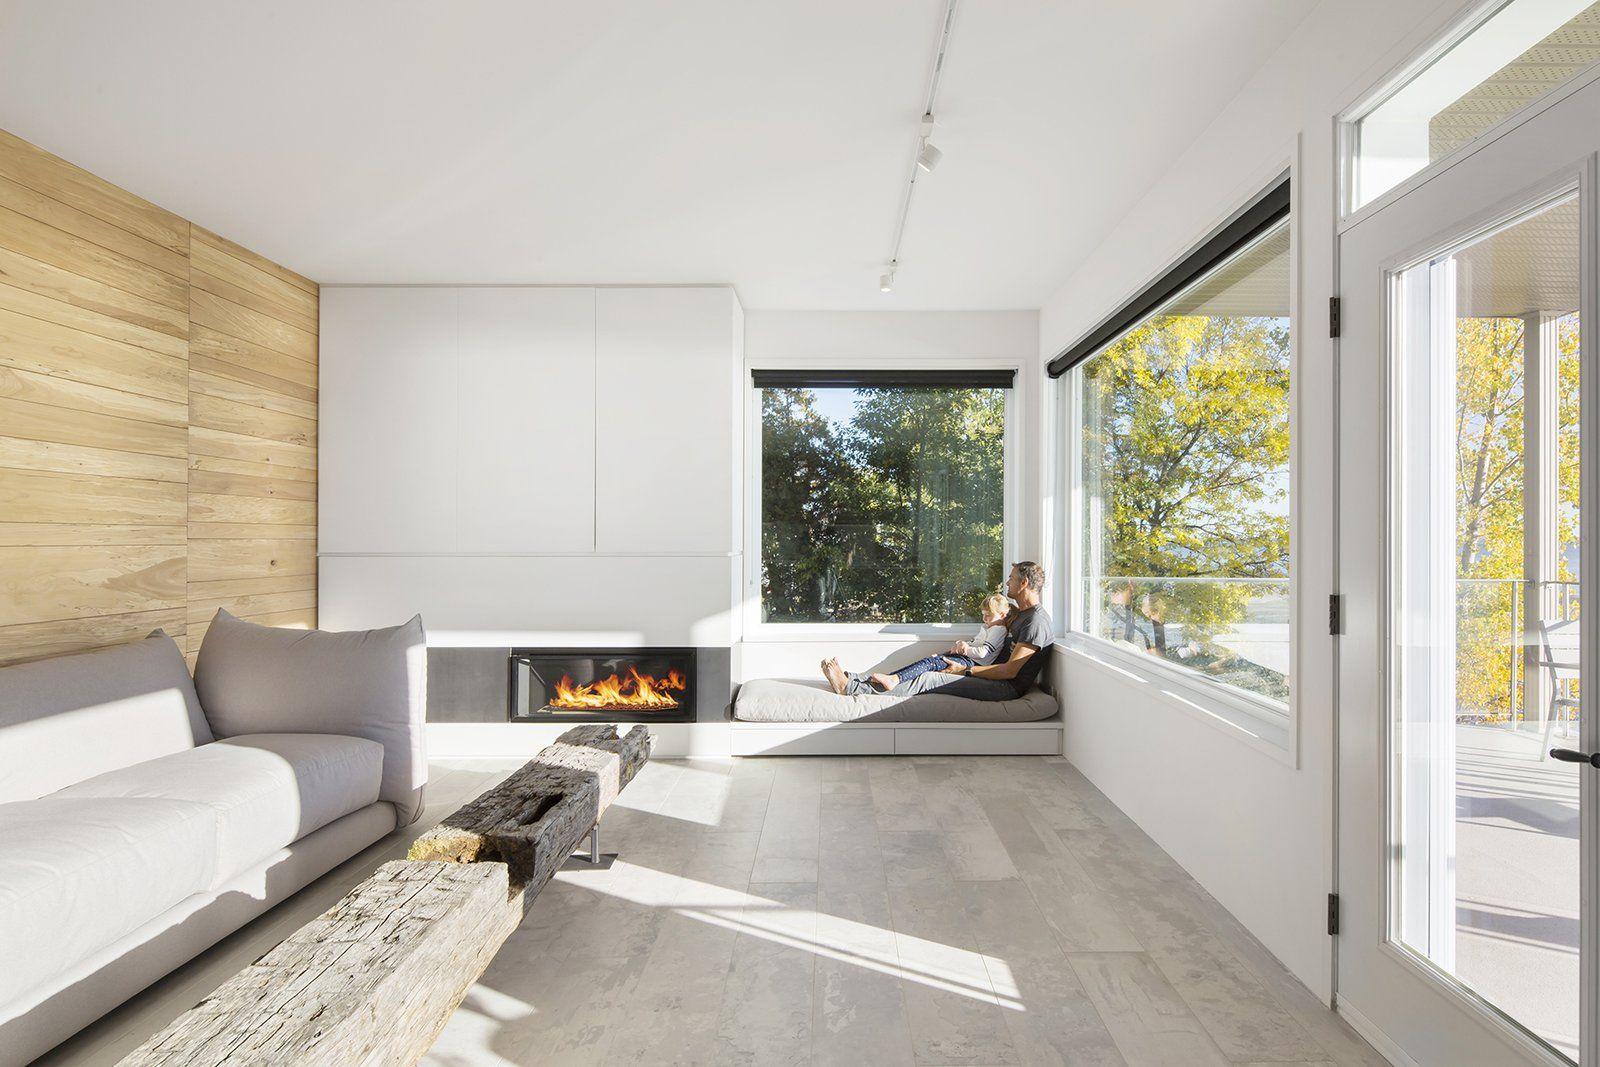 r3r architectural elements fireplace design home decor modern rh pinterest com